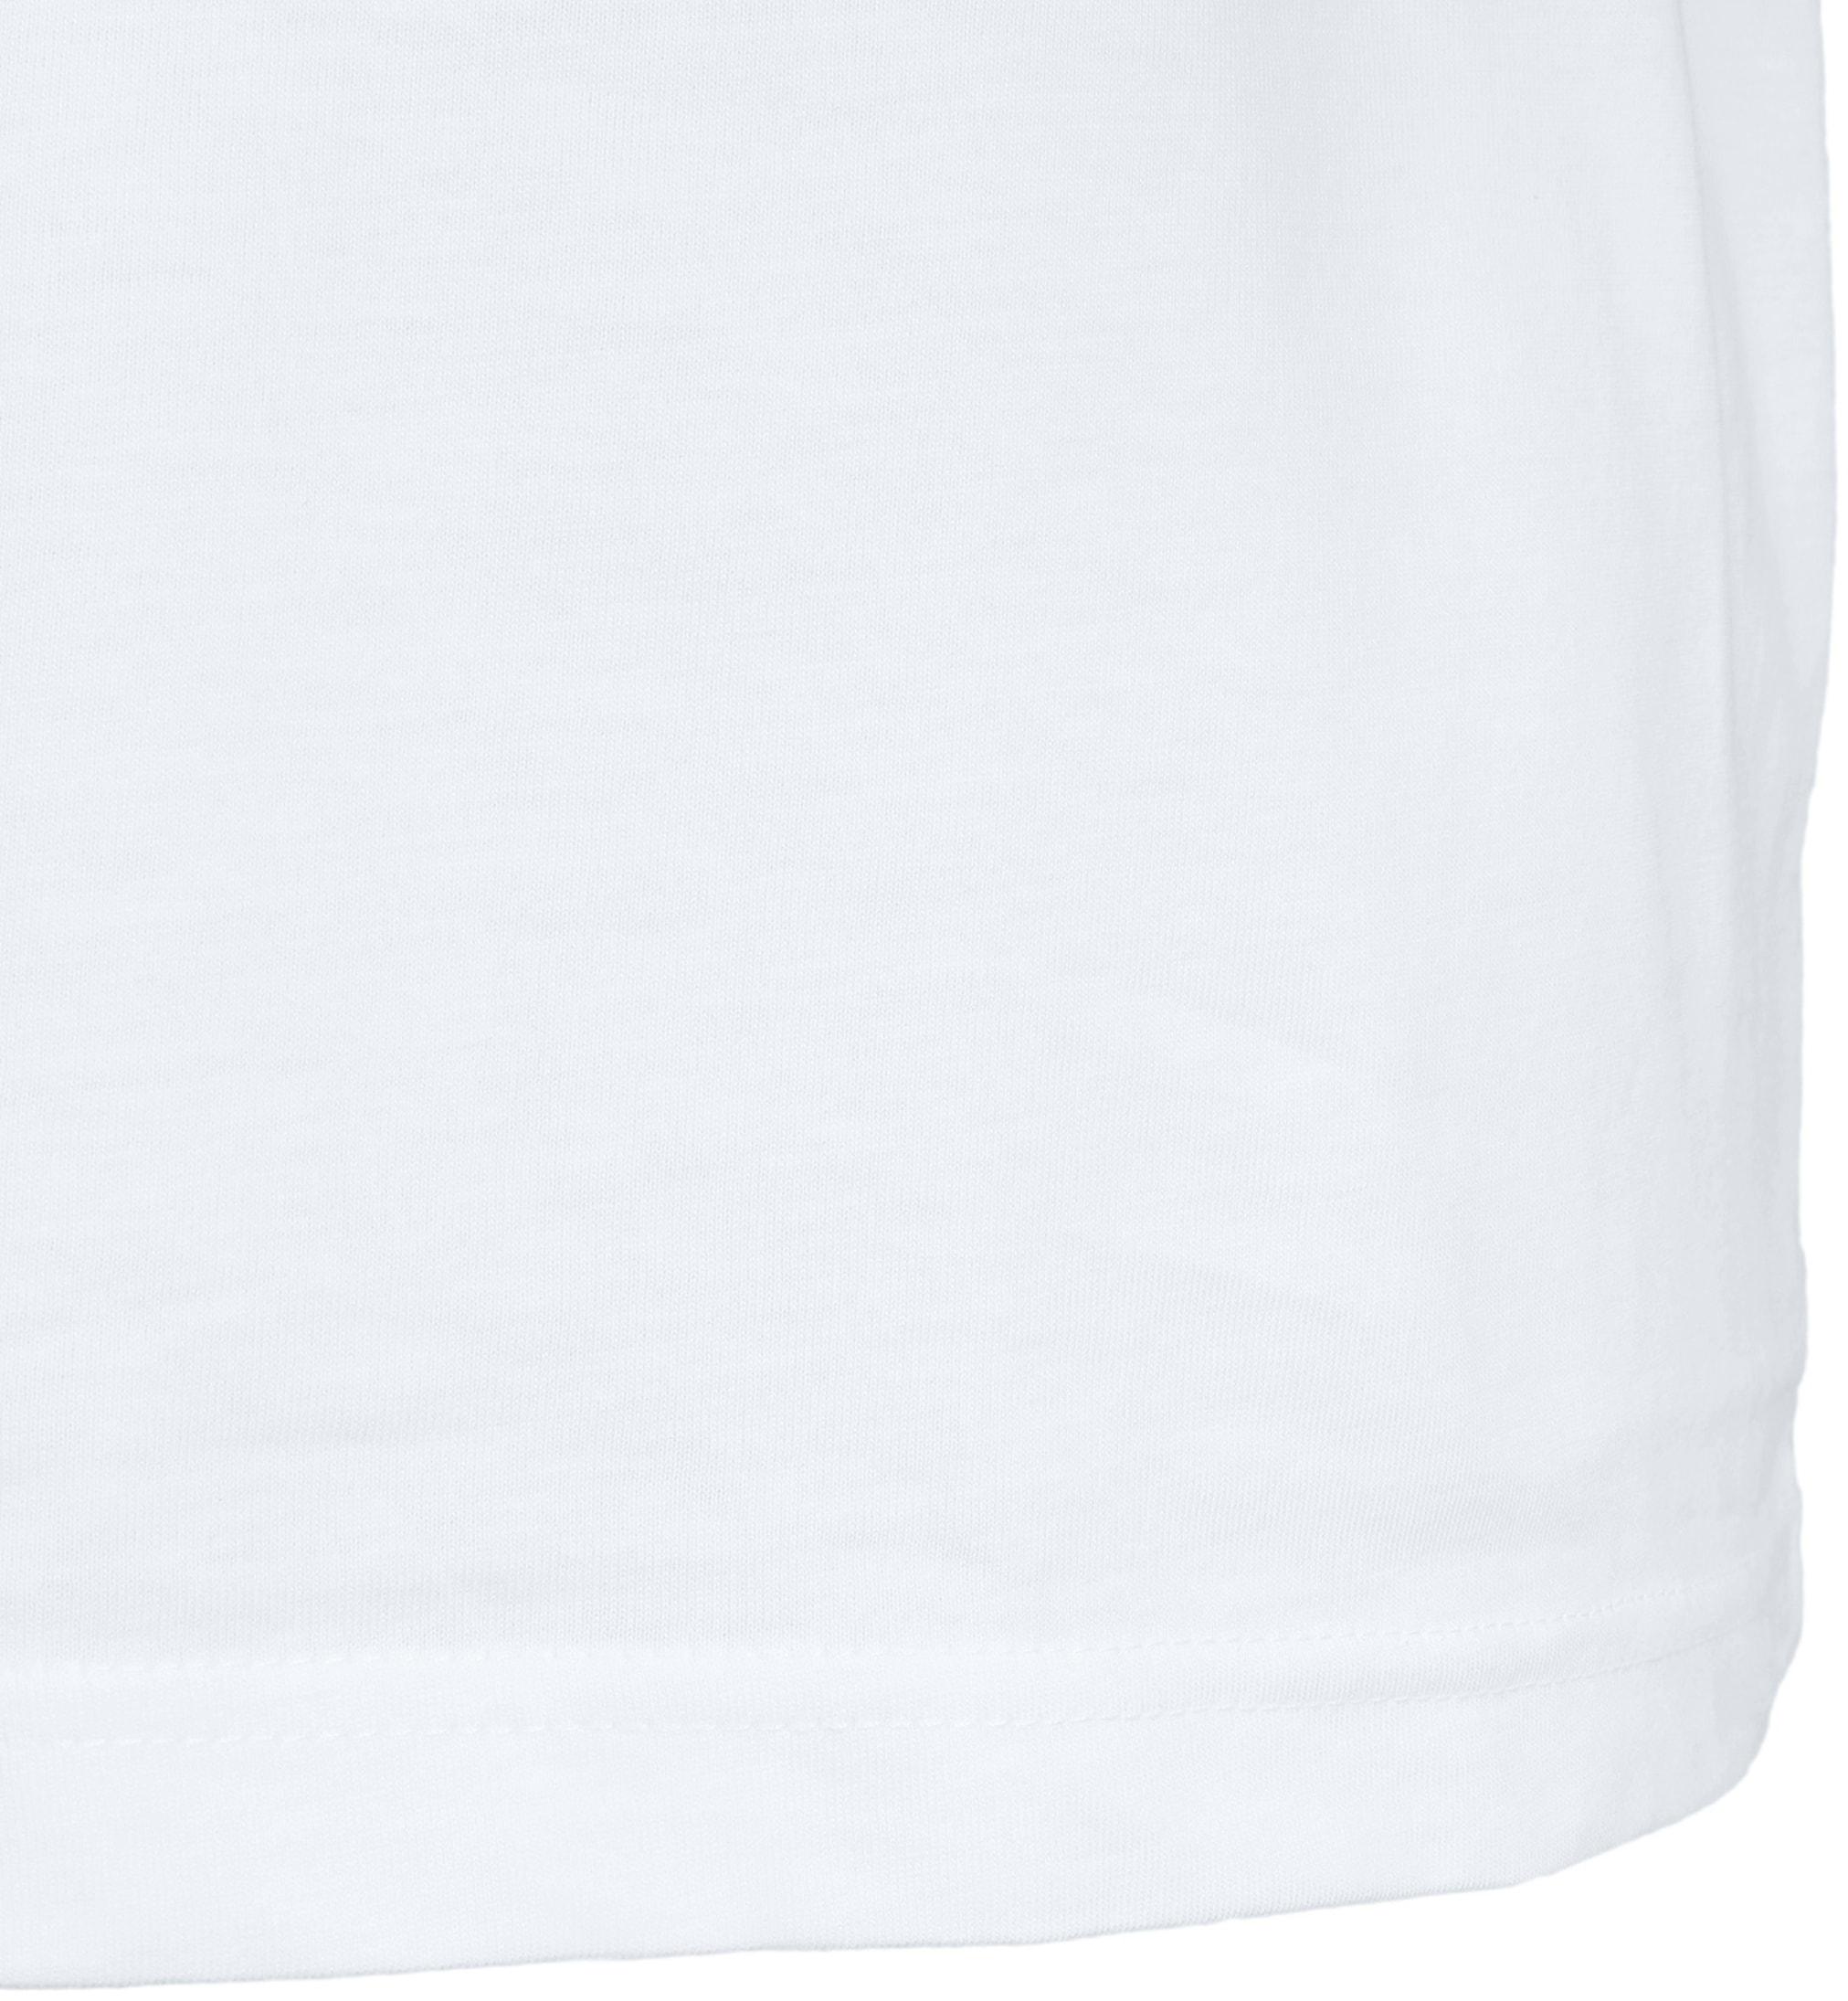 T-shirt Brede Ronde Hals 6-Pack (6 stuks) foto 4